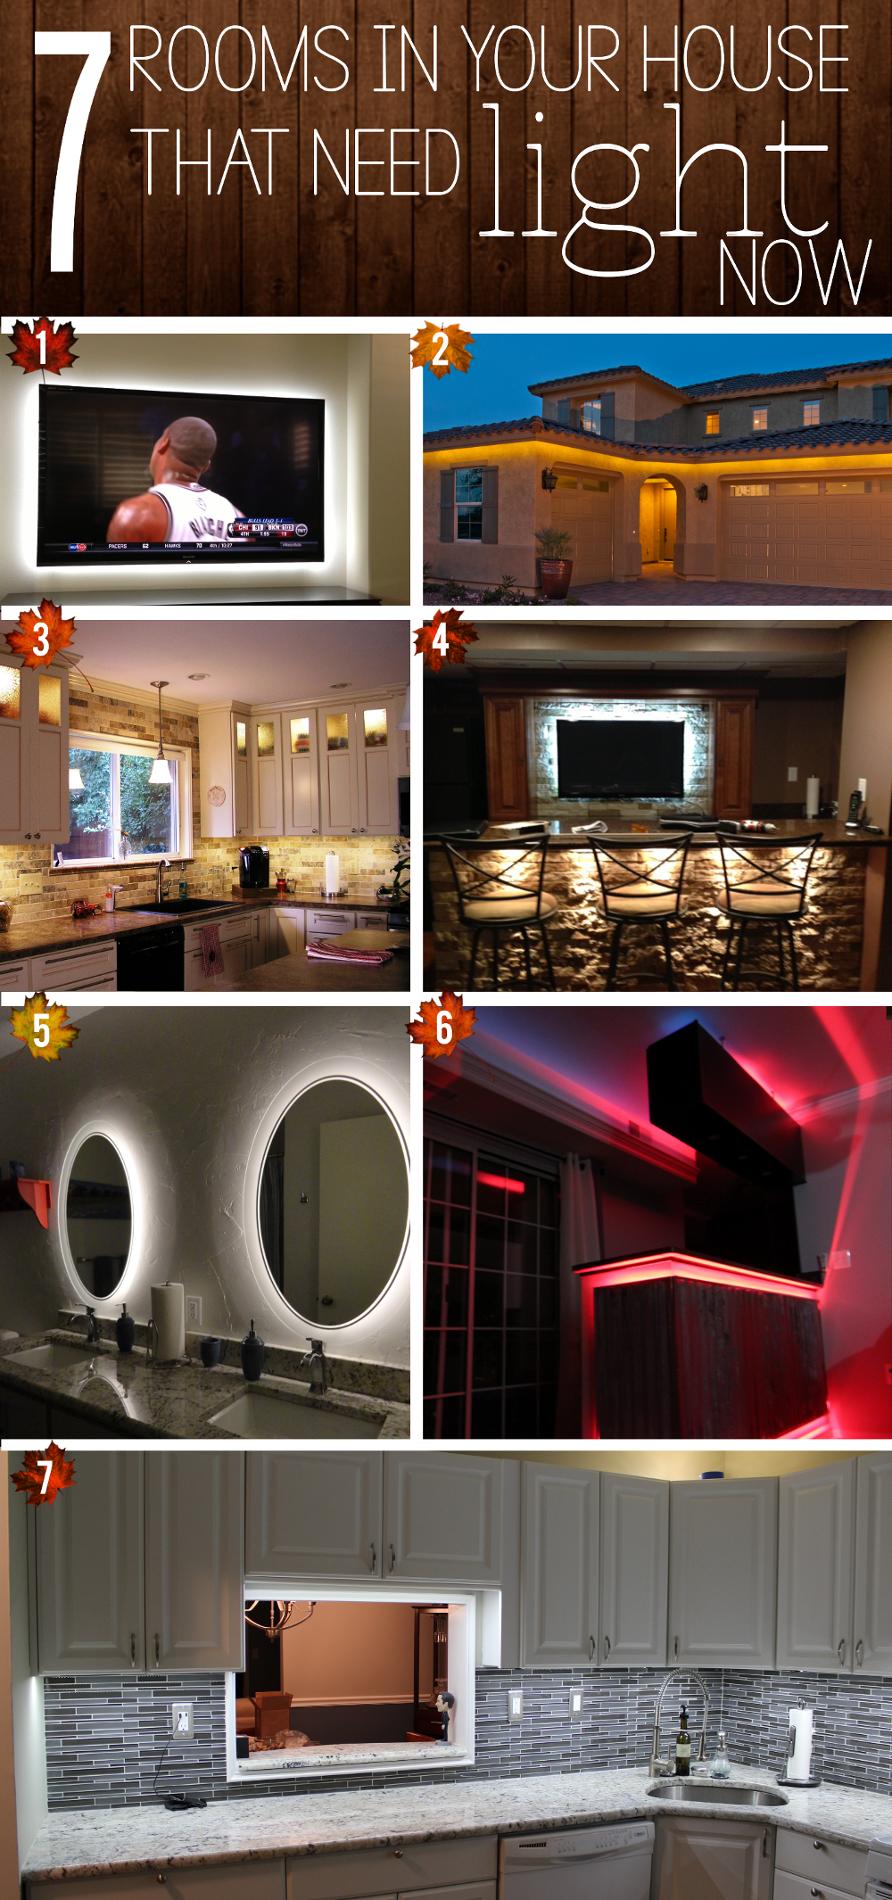 Under loft bed lighting ideas   Beautiful Kitchen Lighting Ideas for Your New Kitchen  creative